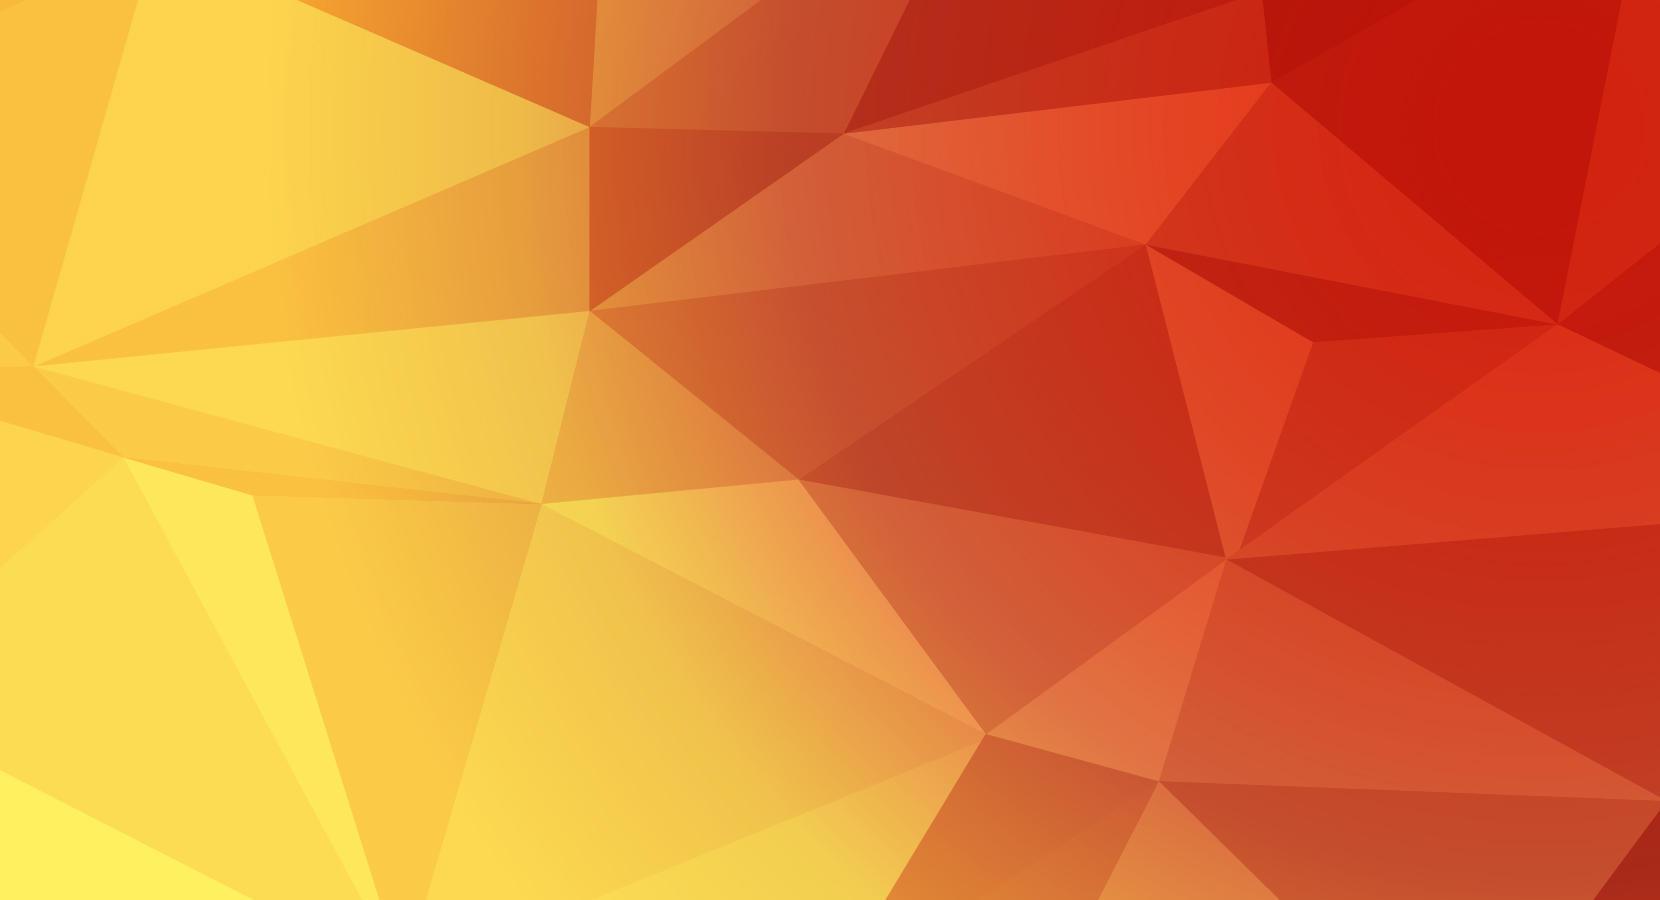 Origami Colours By Nova G On Deviantart